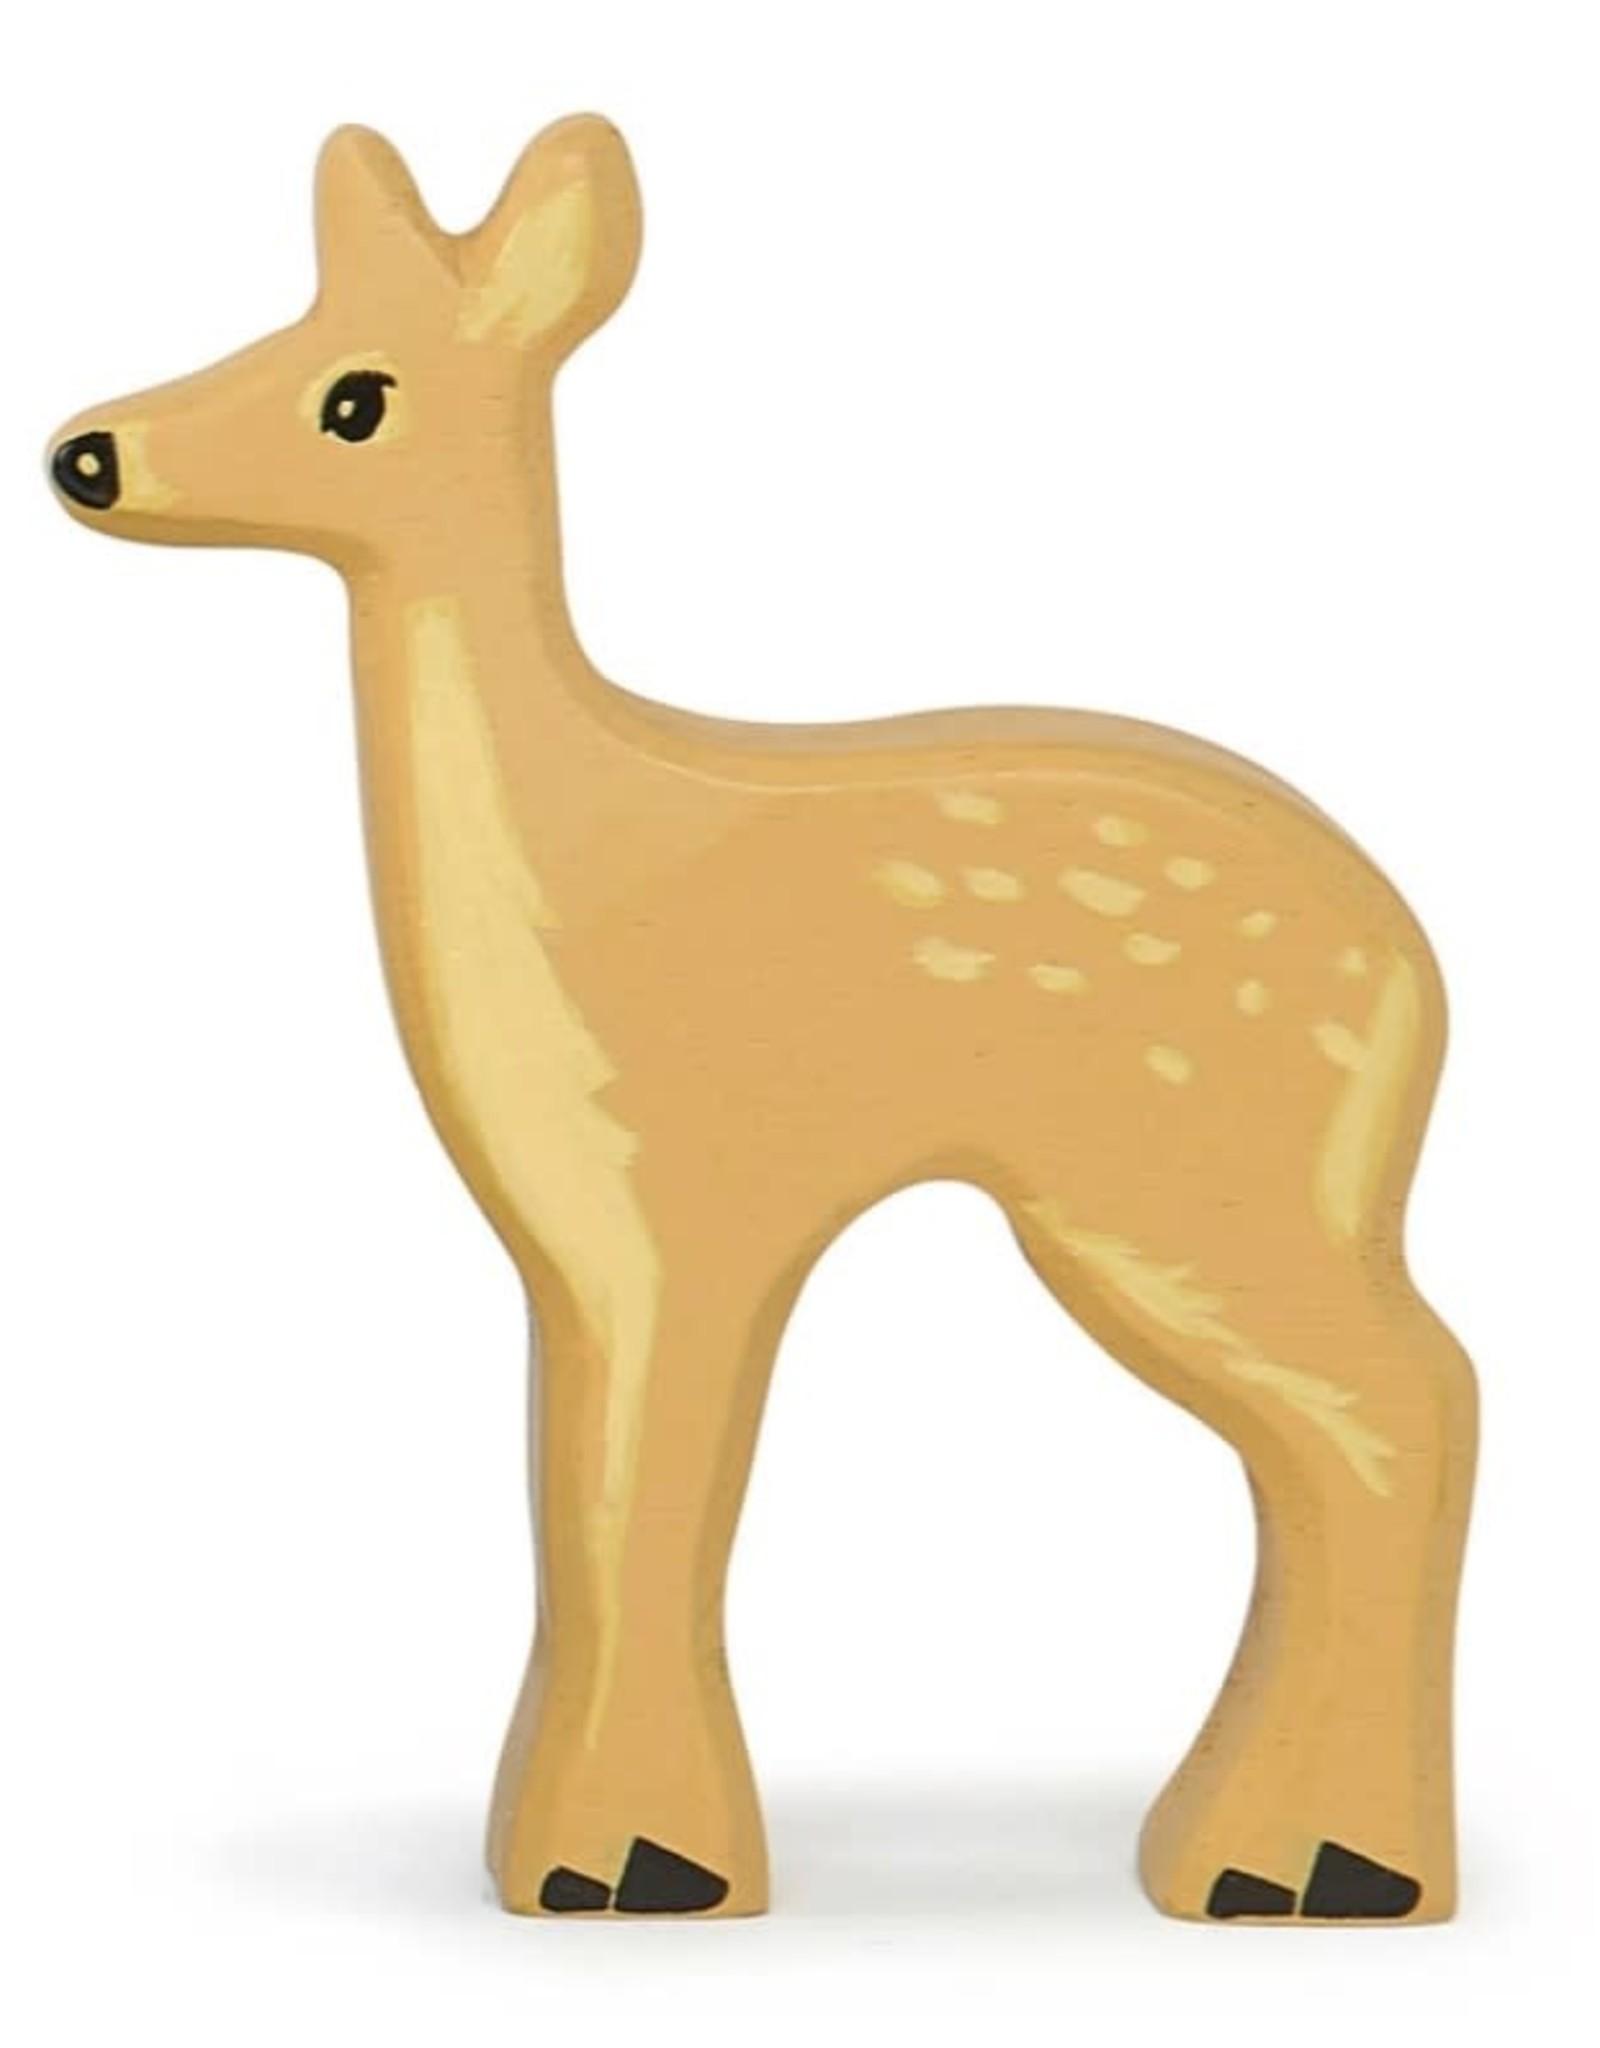 Tender Leaf Toys Tender Leaf Wooden Deer